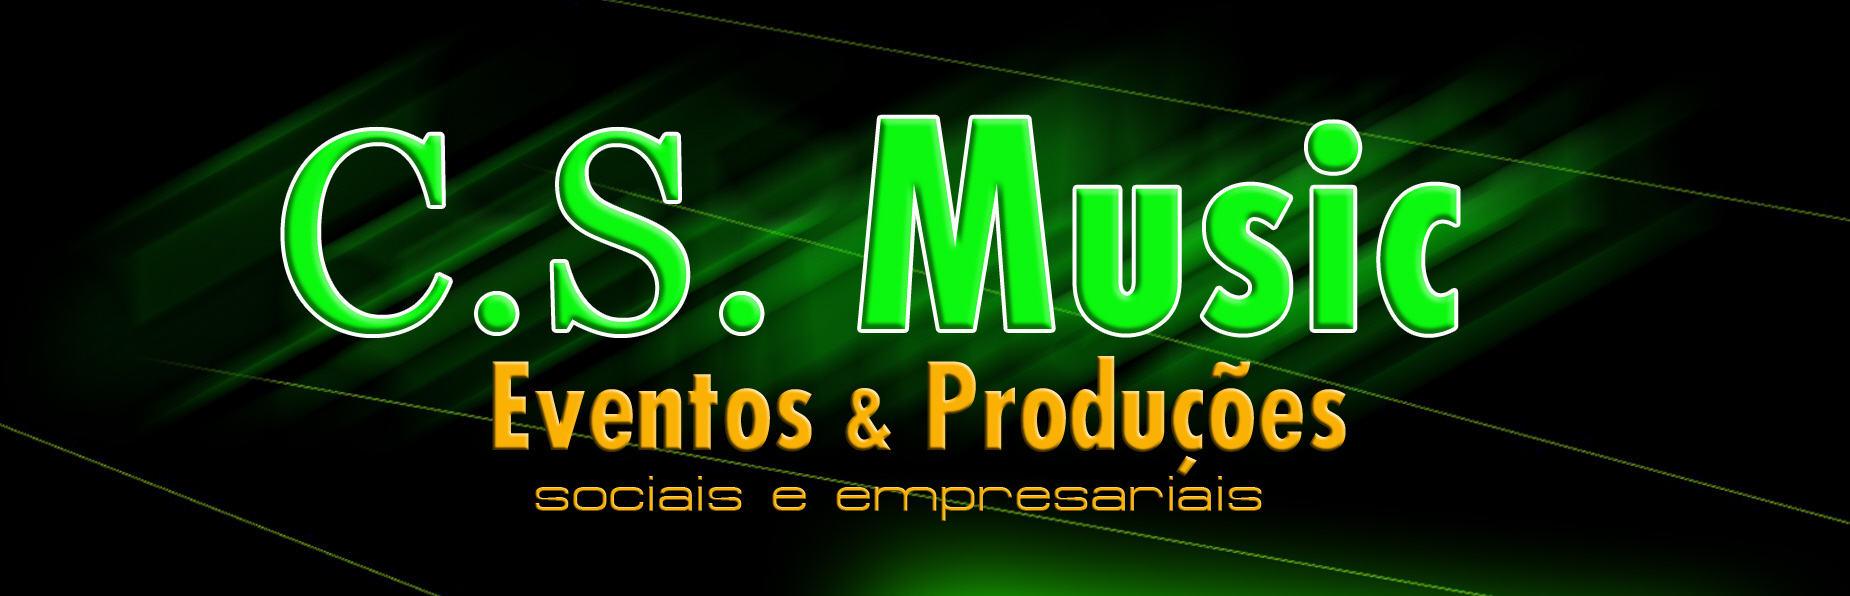 logo_Alta.jpg